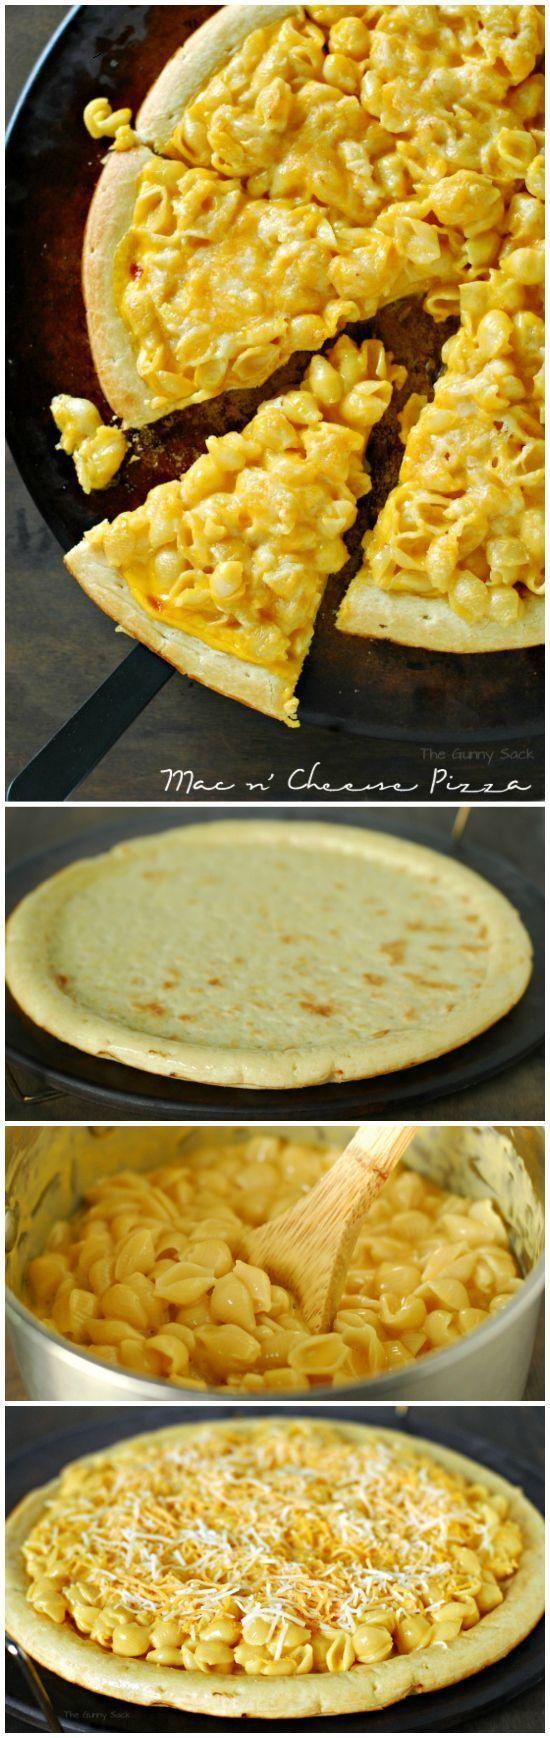 Macaroni and Cheese Pizza Recipe | Yummy Recipes | Pinterest